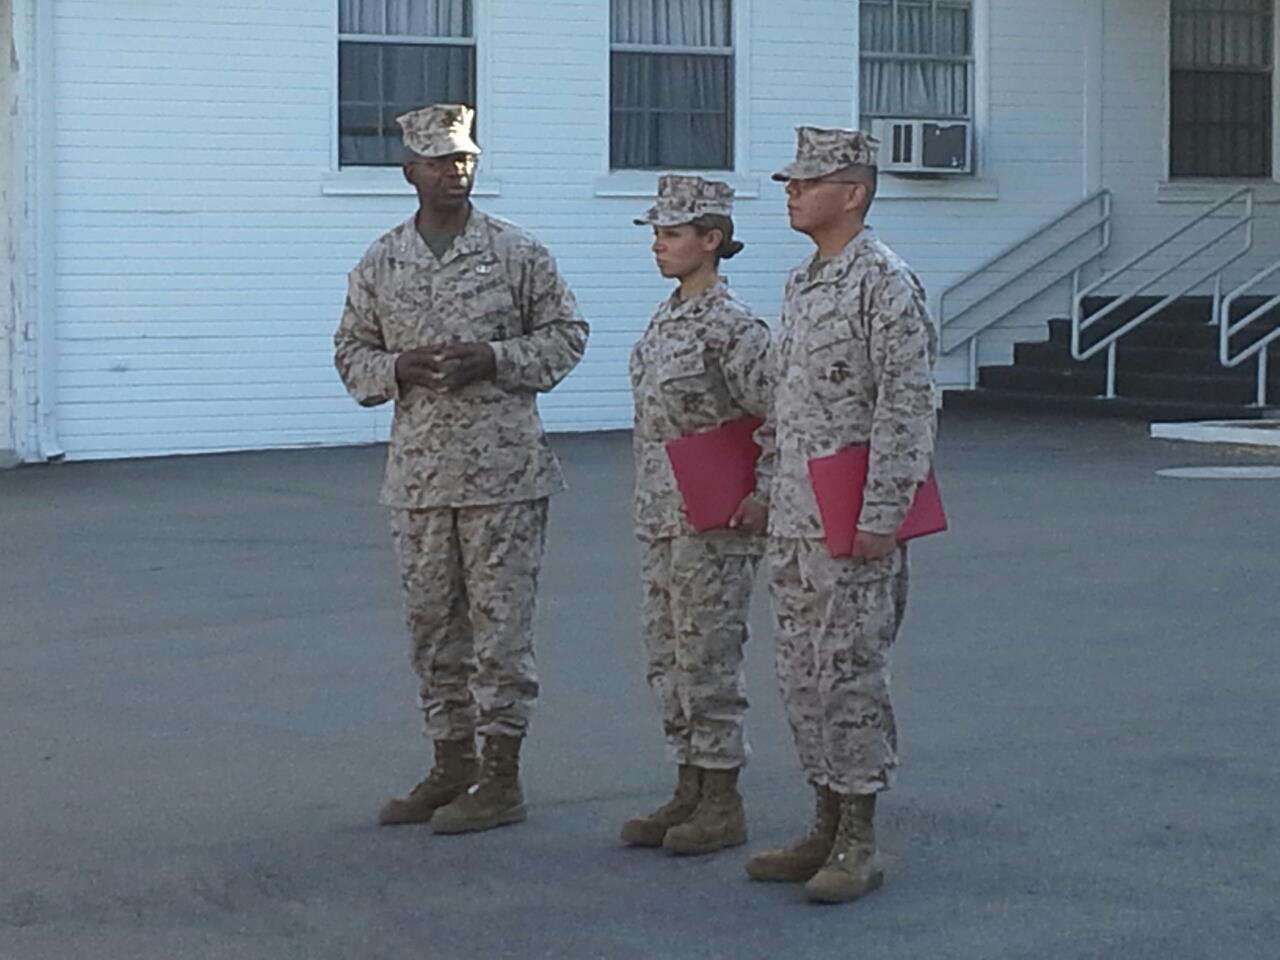 On September 4, 2012 the U.S. Marine Corps (USMC) promoted Sara Samora to corporal.